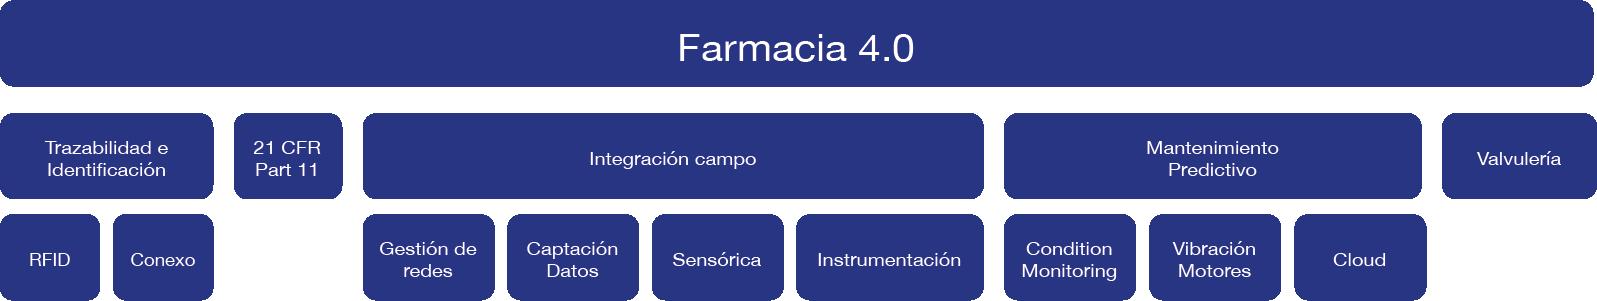 esquema farmacia 40